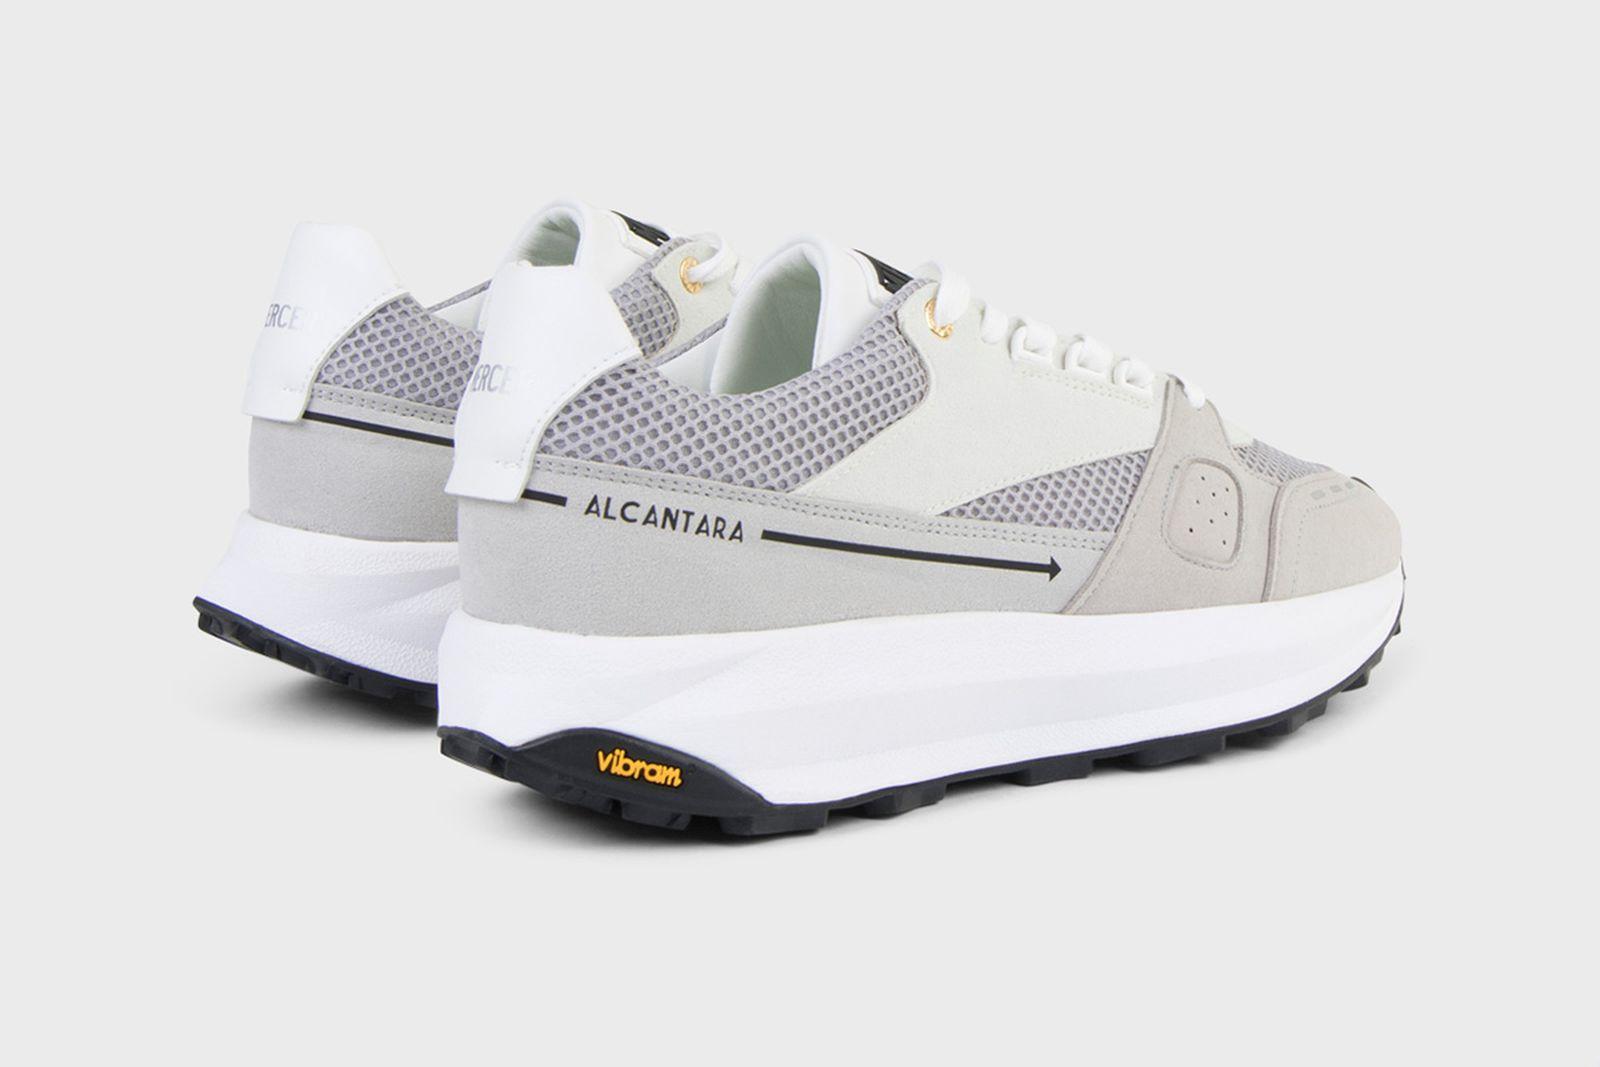 mercer-alcantara-sneaker-release-date-price-02